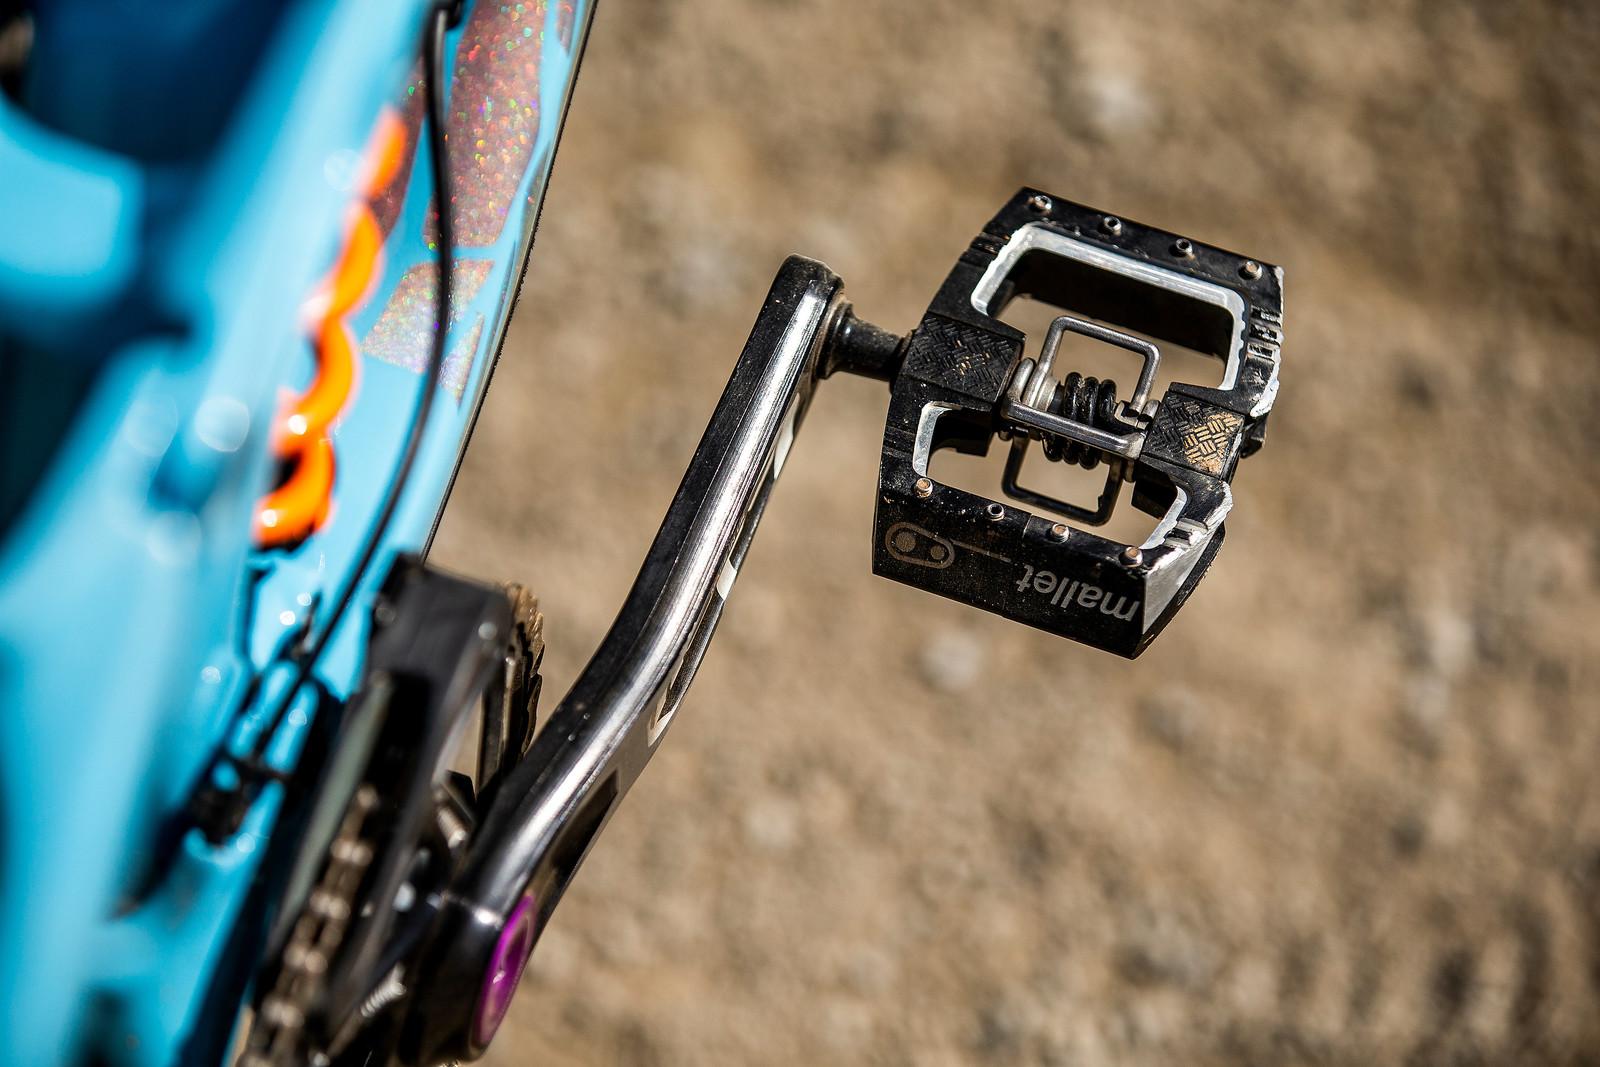 Crank Brothers Mallet DH Pedals - WINNING BIKE - Rachel Atherton's Trek Session - Mountain Biking Pictures - Vital MTB